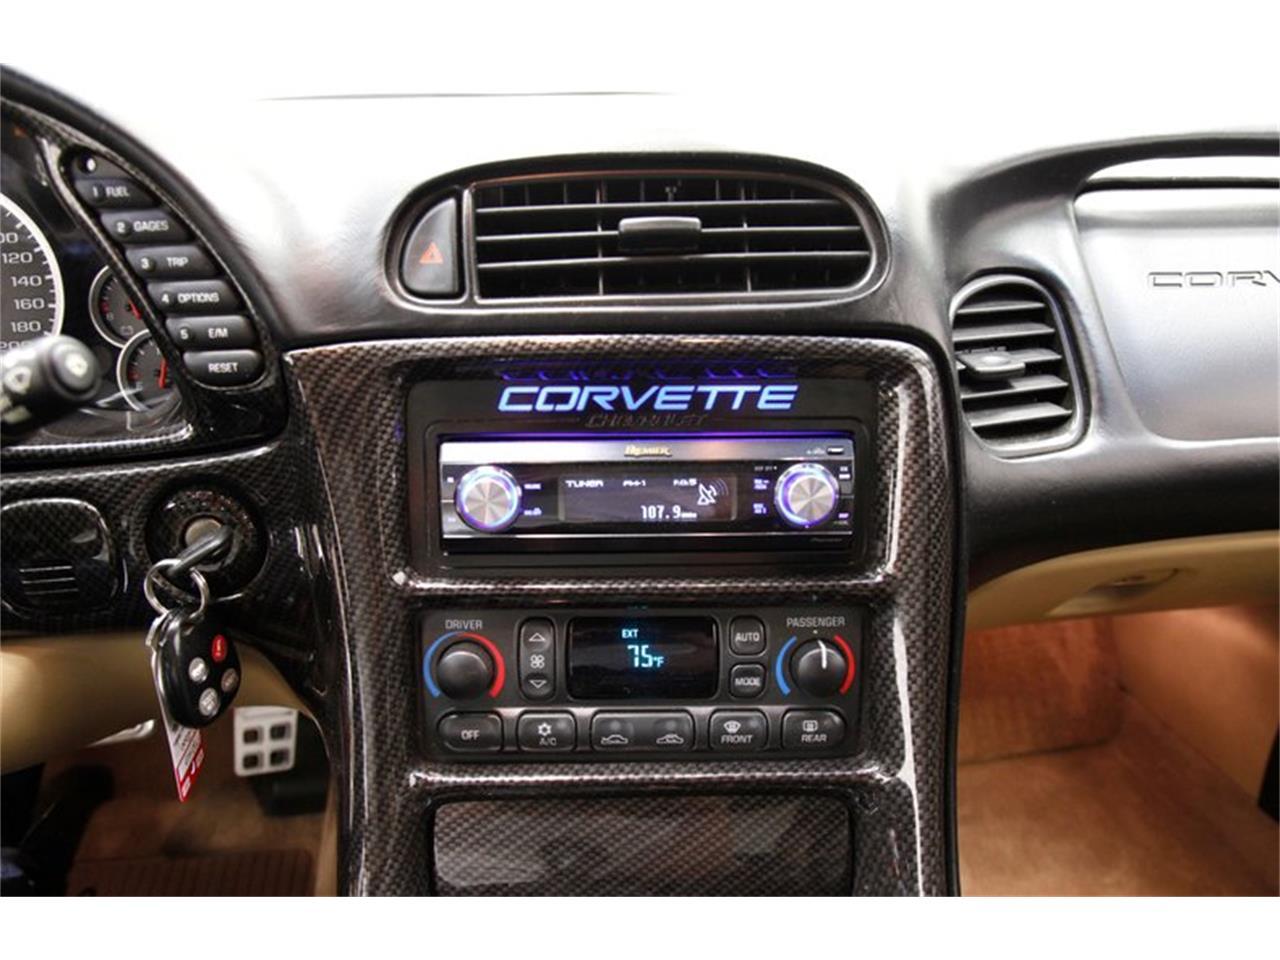 2000 Chevrolet Corvette (CC-1367933) for sale in Morgantown, Pennsylvania